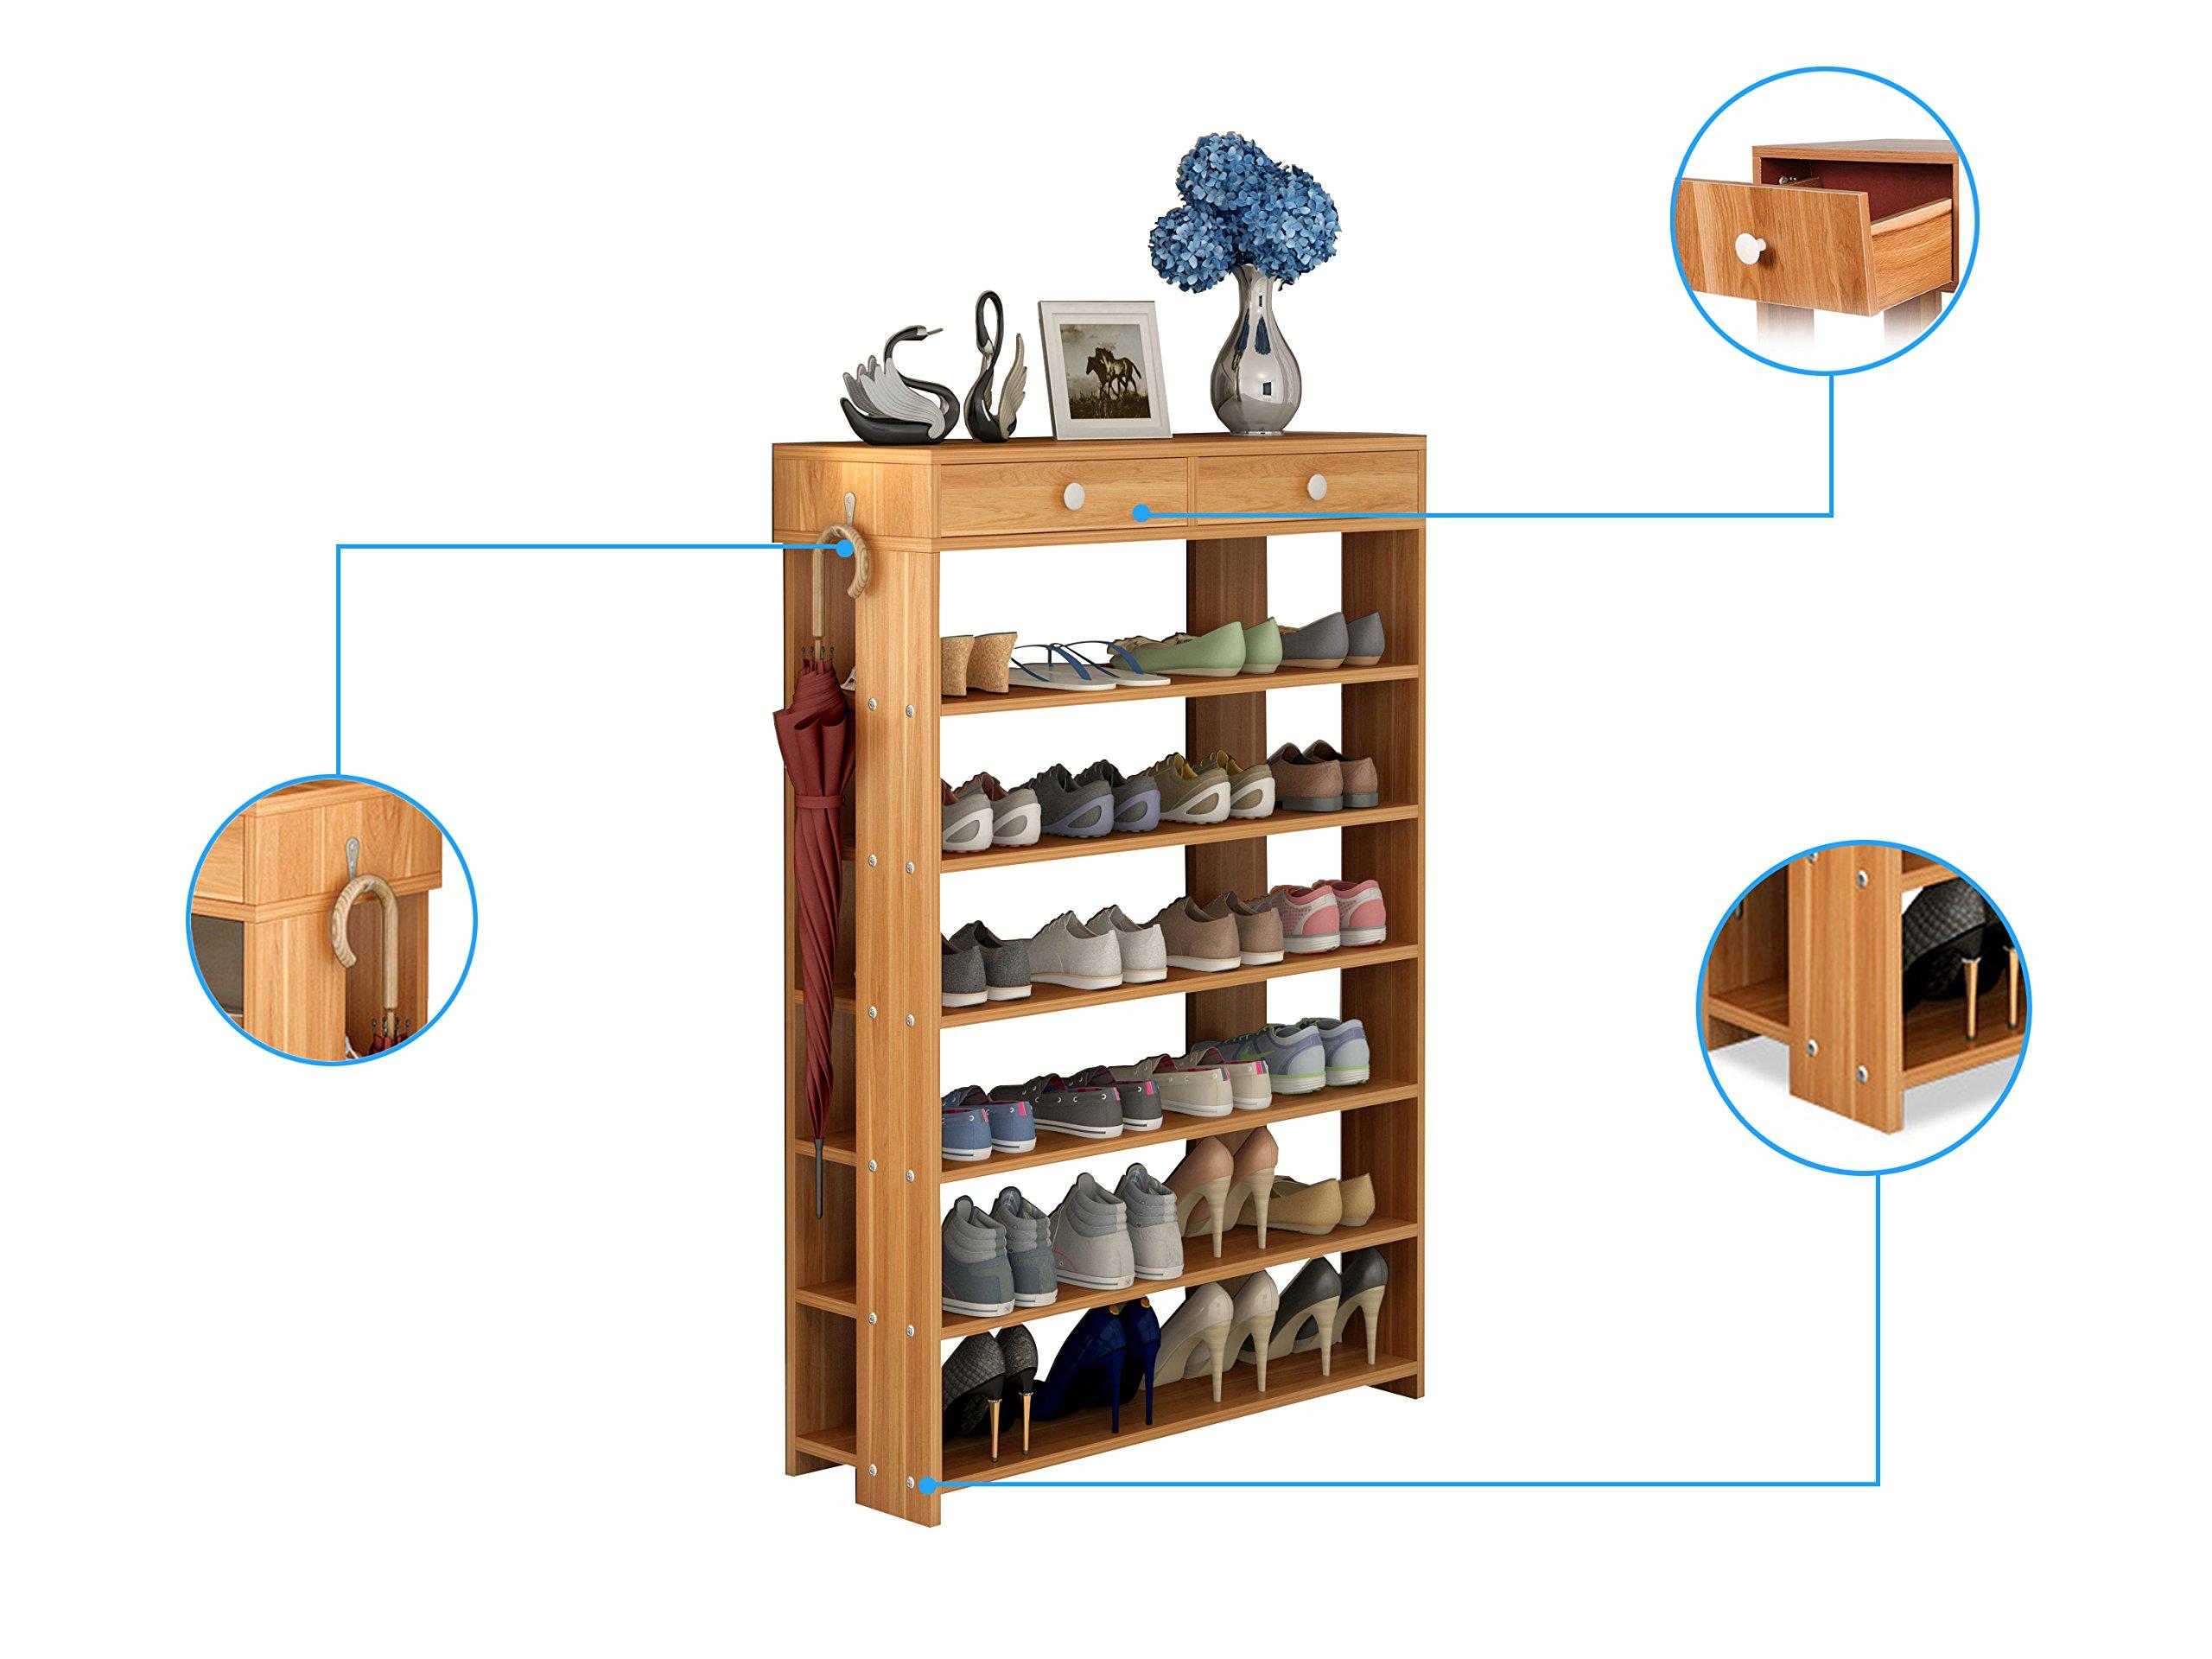 Polar Aurora Shoe Racks 7 Tiers Multi-function Economy Storage Rack Standing Shelf Organizer (Wood) by Polar Aurora (Image #3)